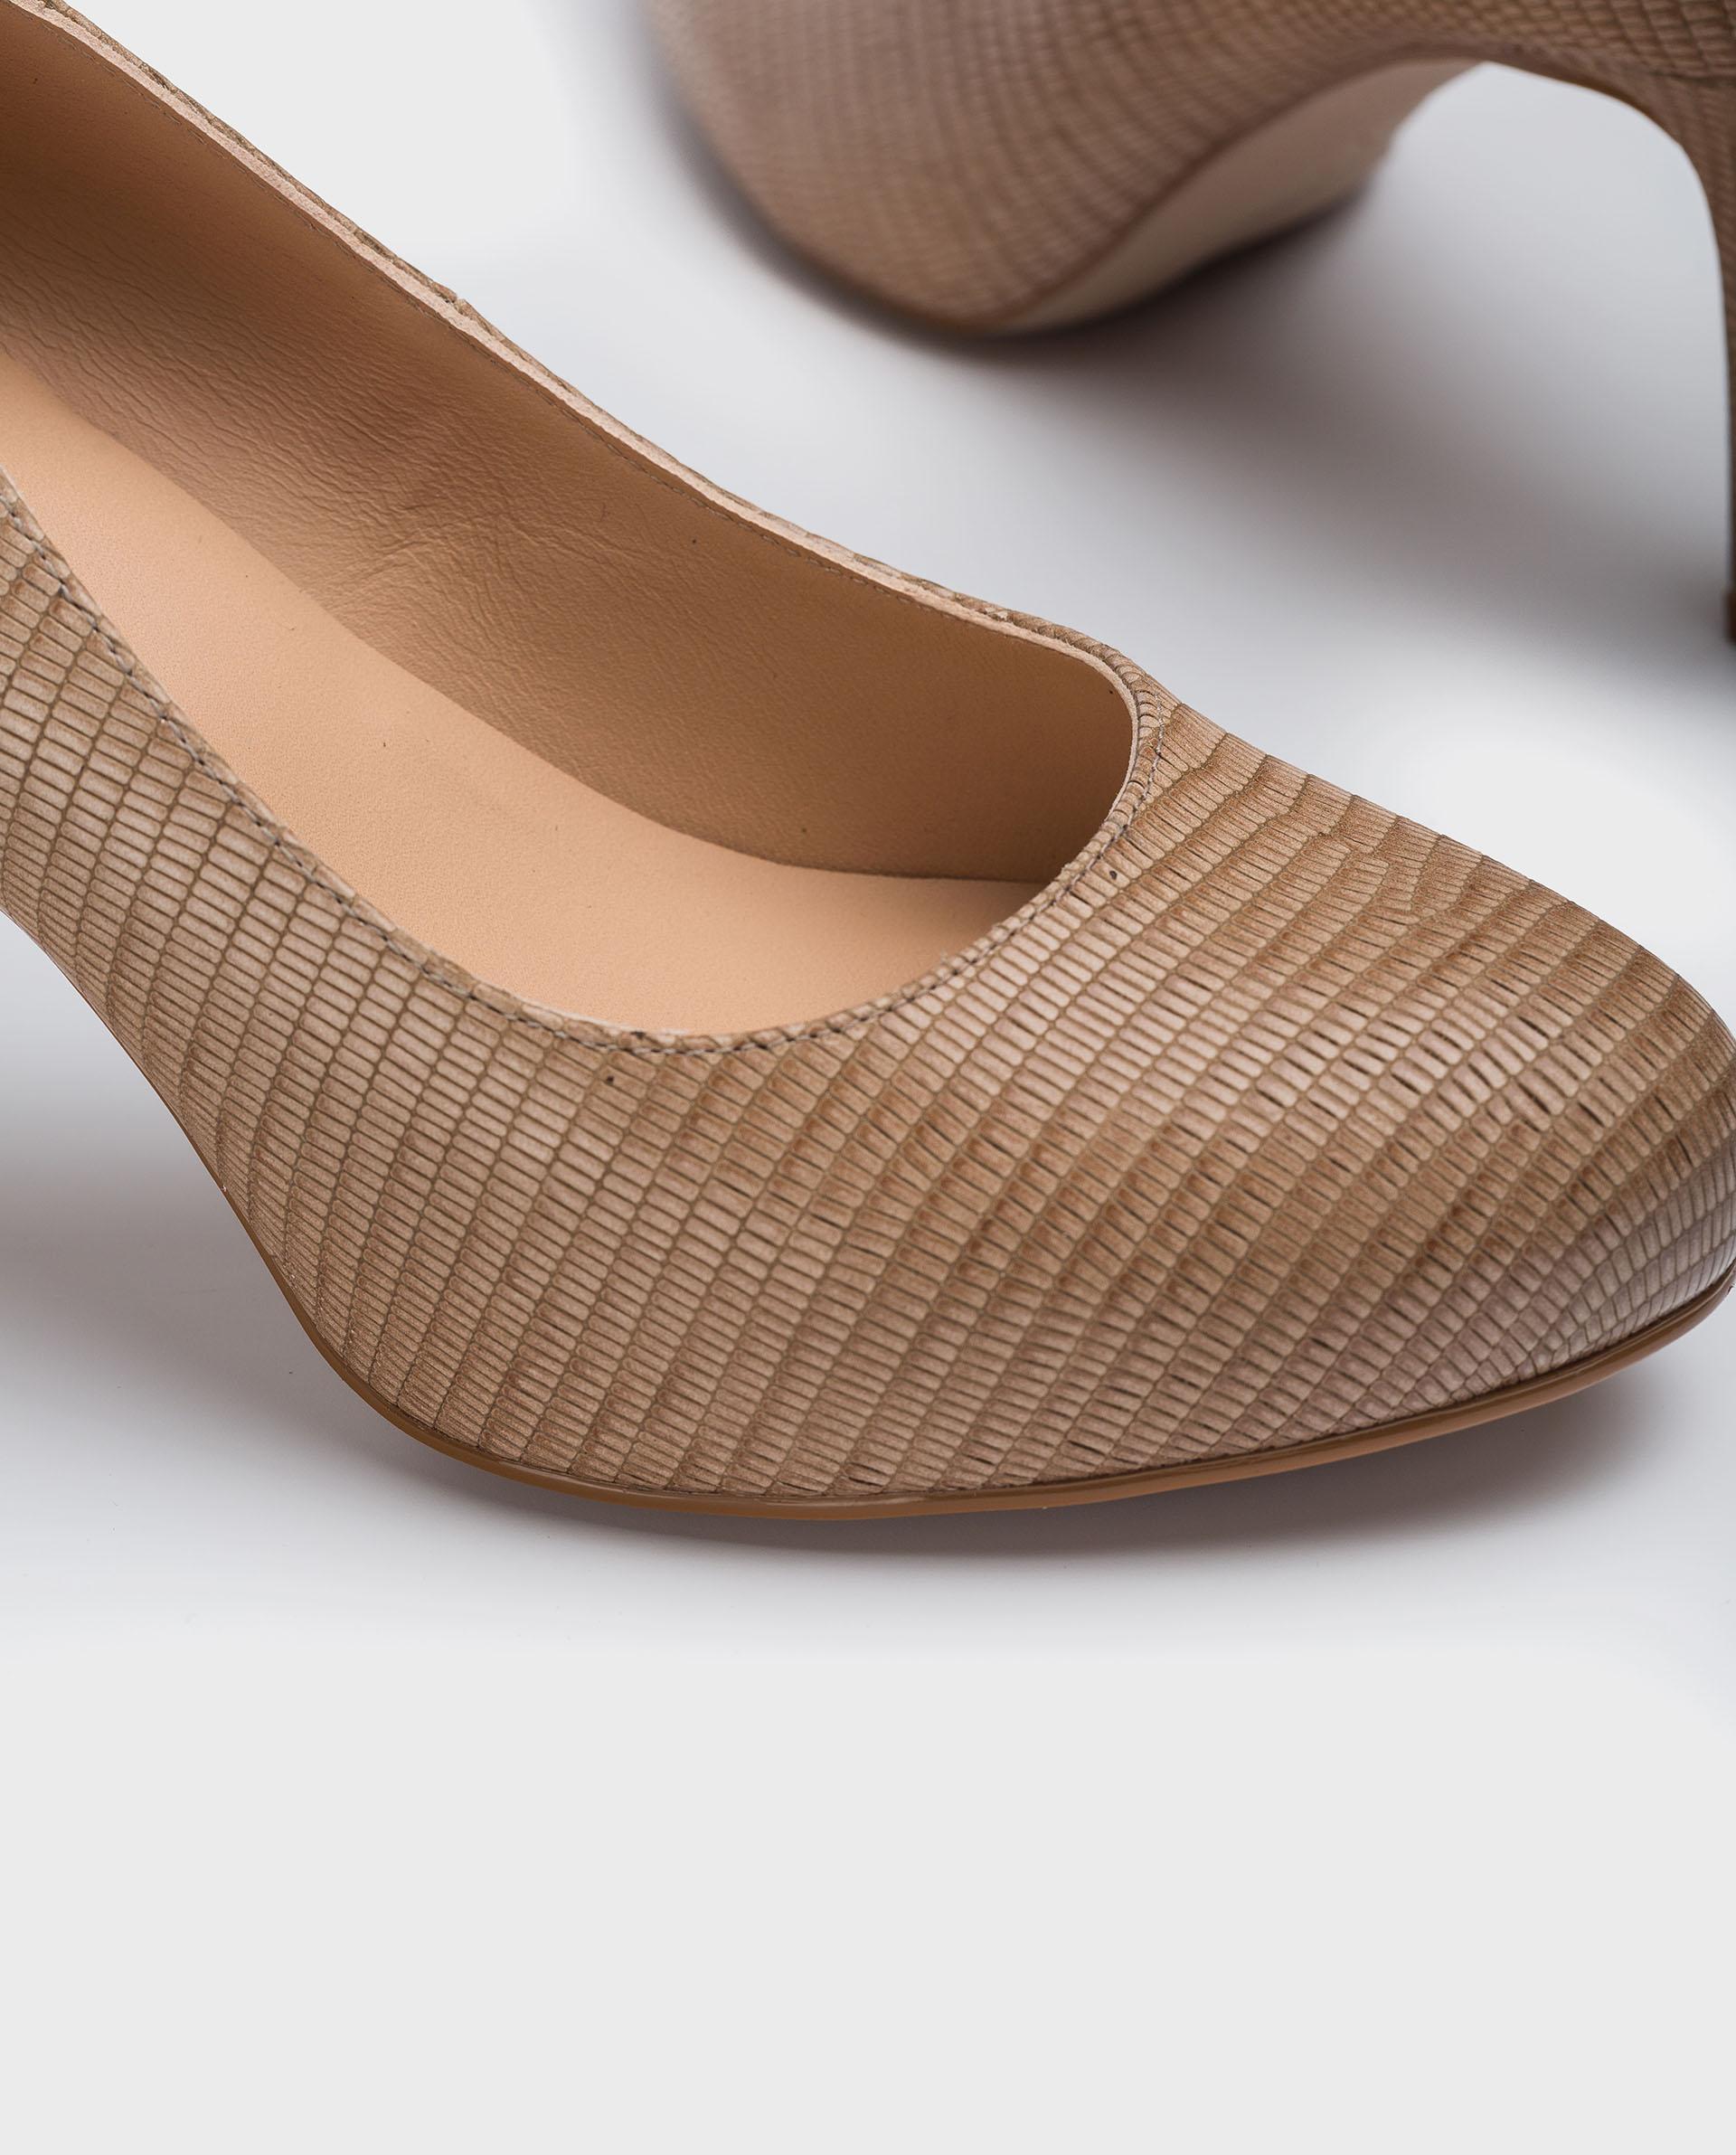 UNISA Croc effect leather round toe pumps NUMIS_21_BTJ 2